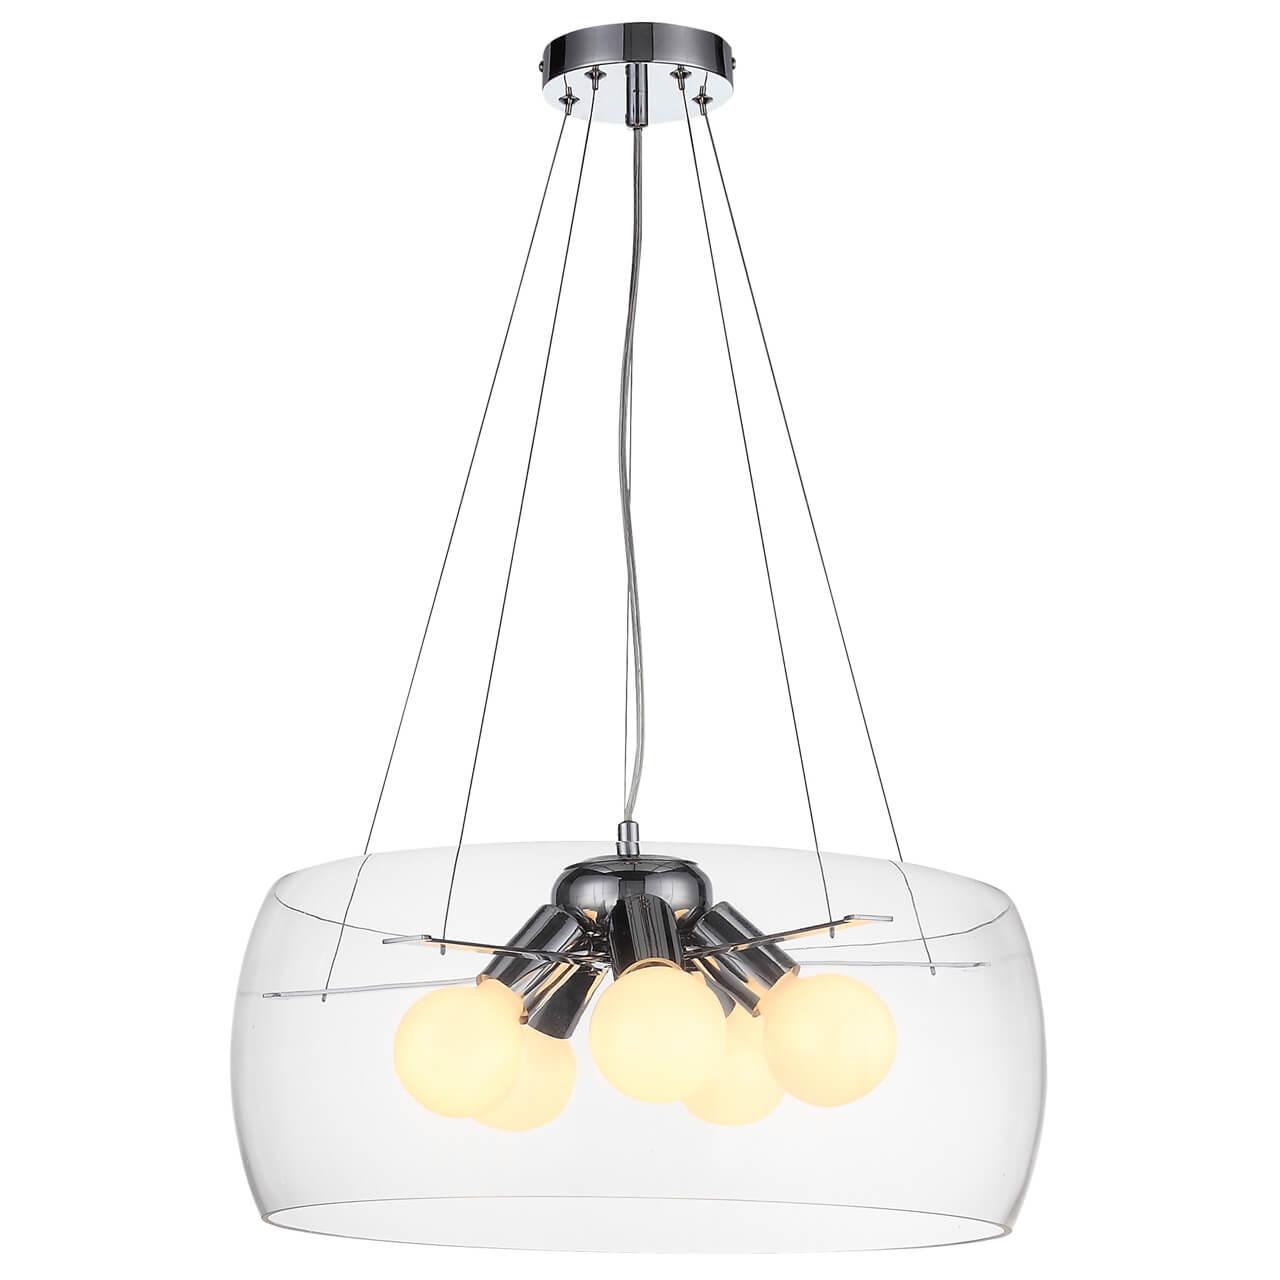 Подвесная люстра ST Luce Uovo SL512.103.05 цены онлайн